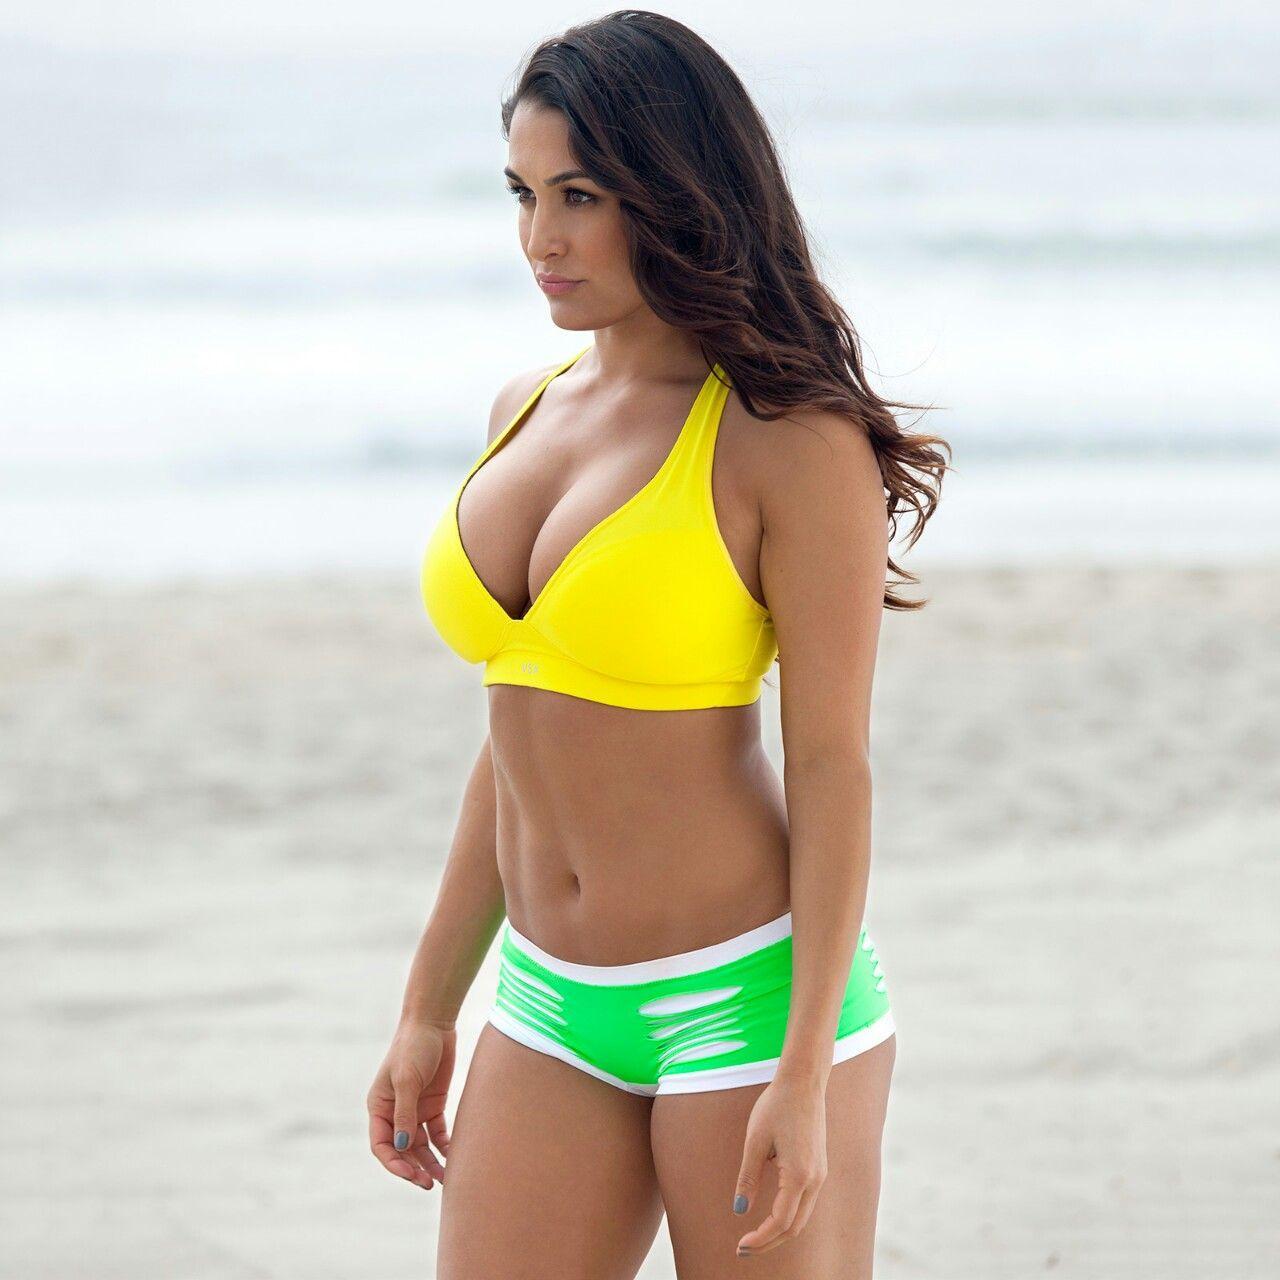 Nikki Bella sexy look